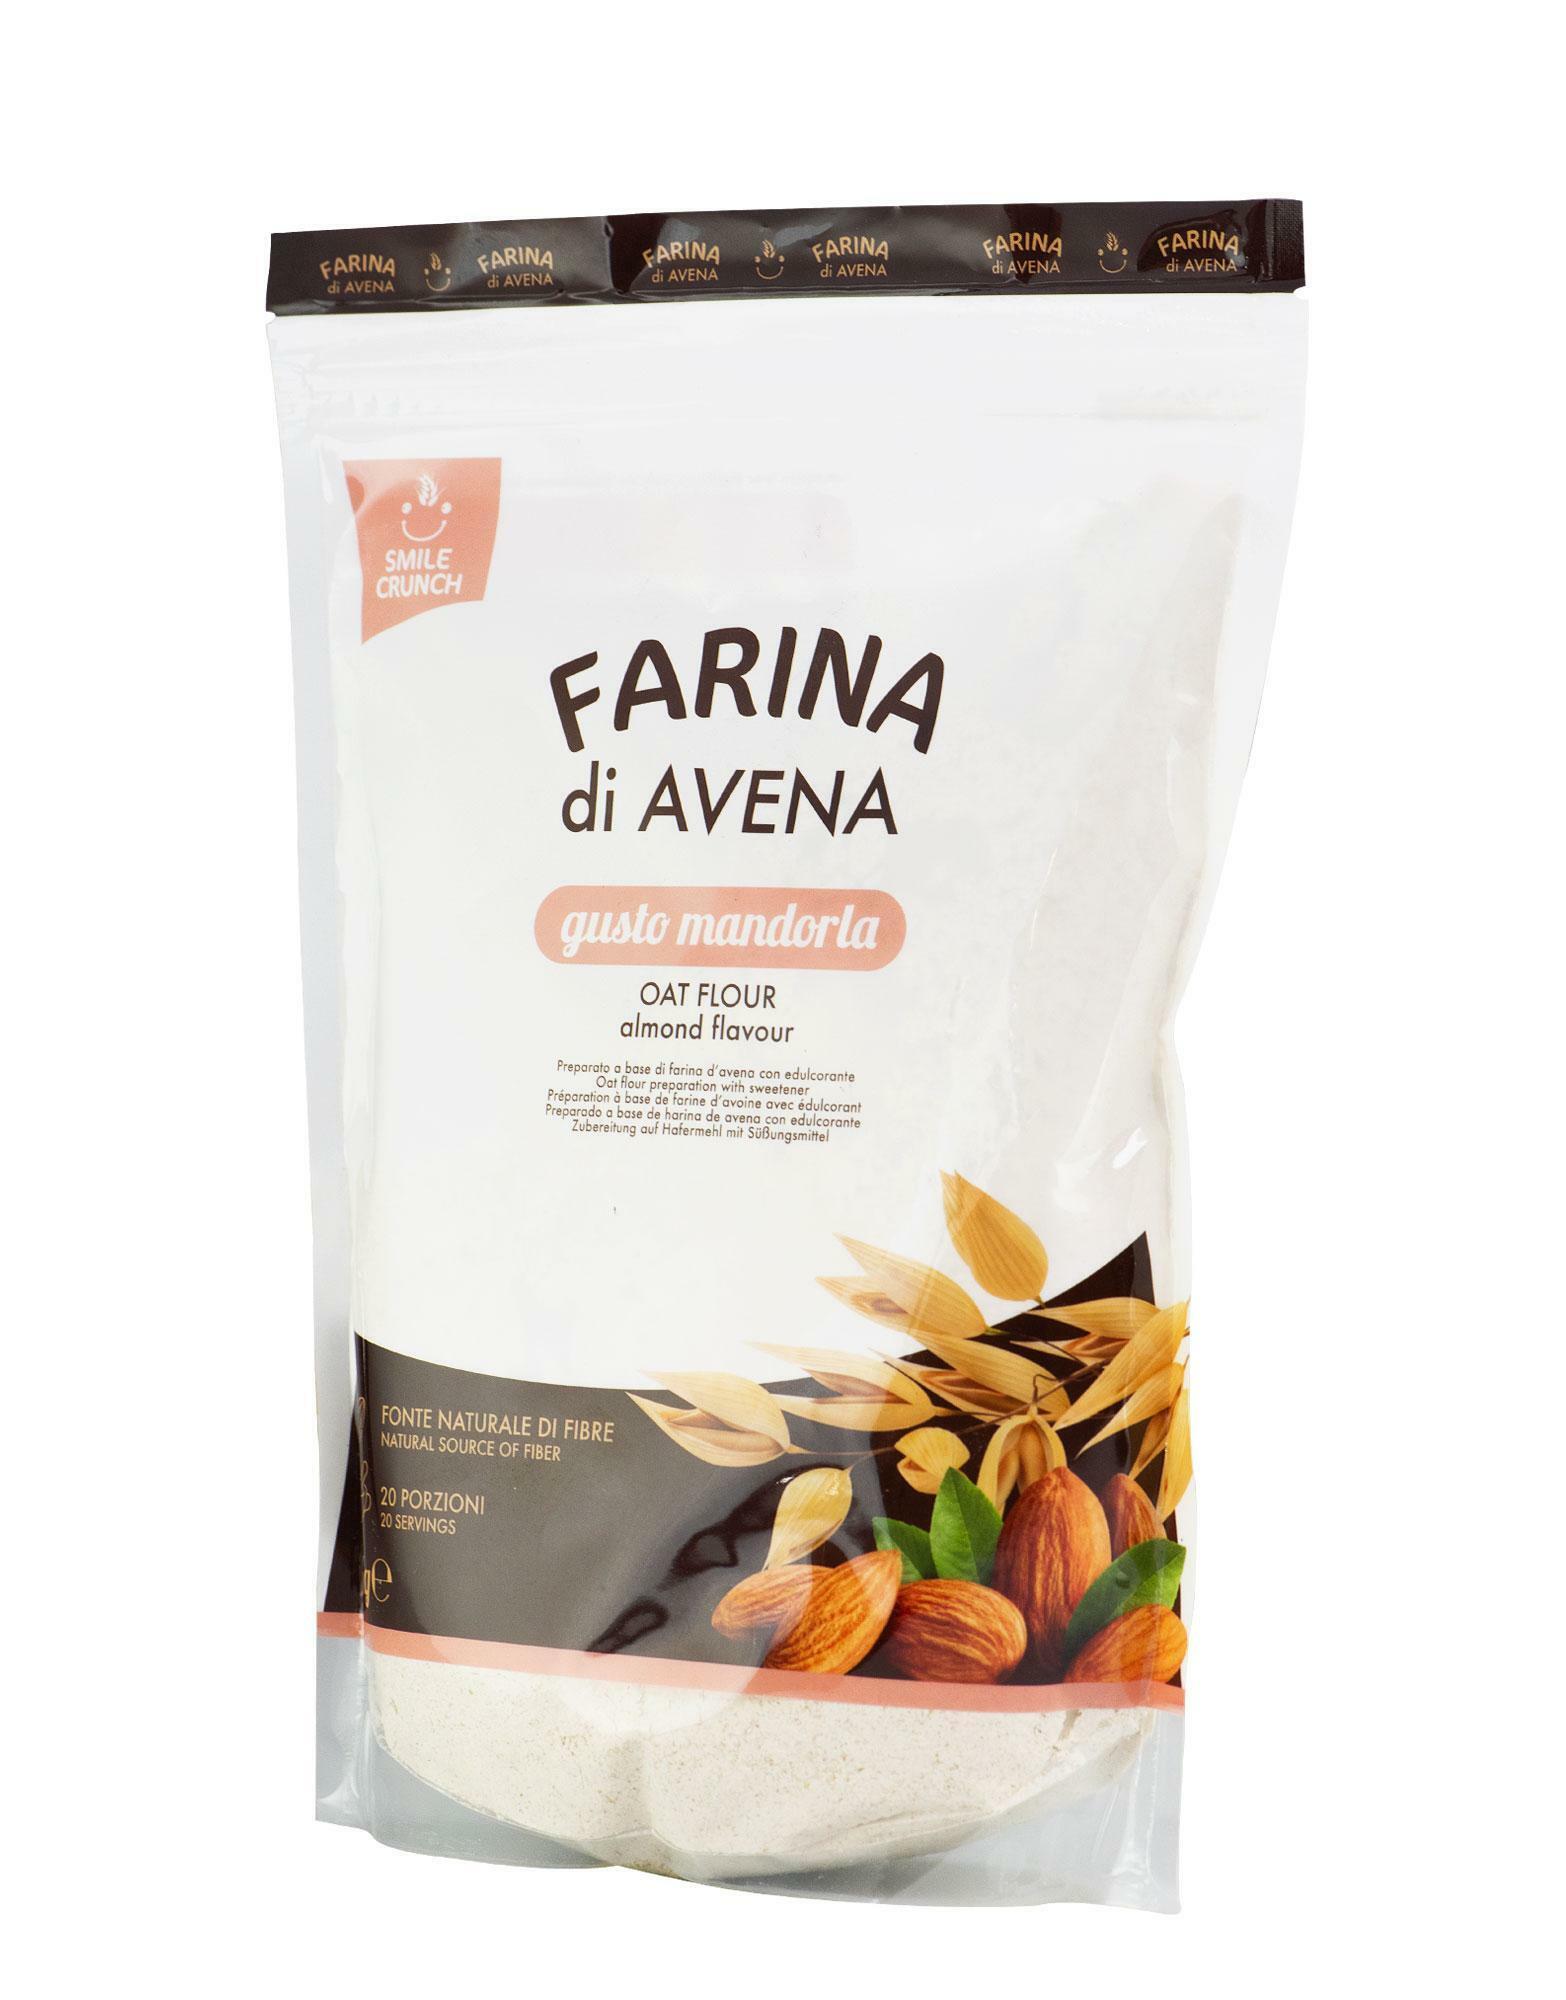 smile crunch oat flour - farina d'avena istantanea gusto mandorla - 1kg